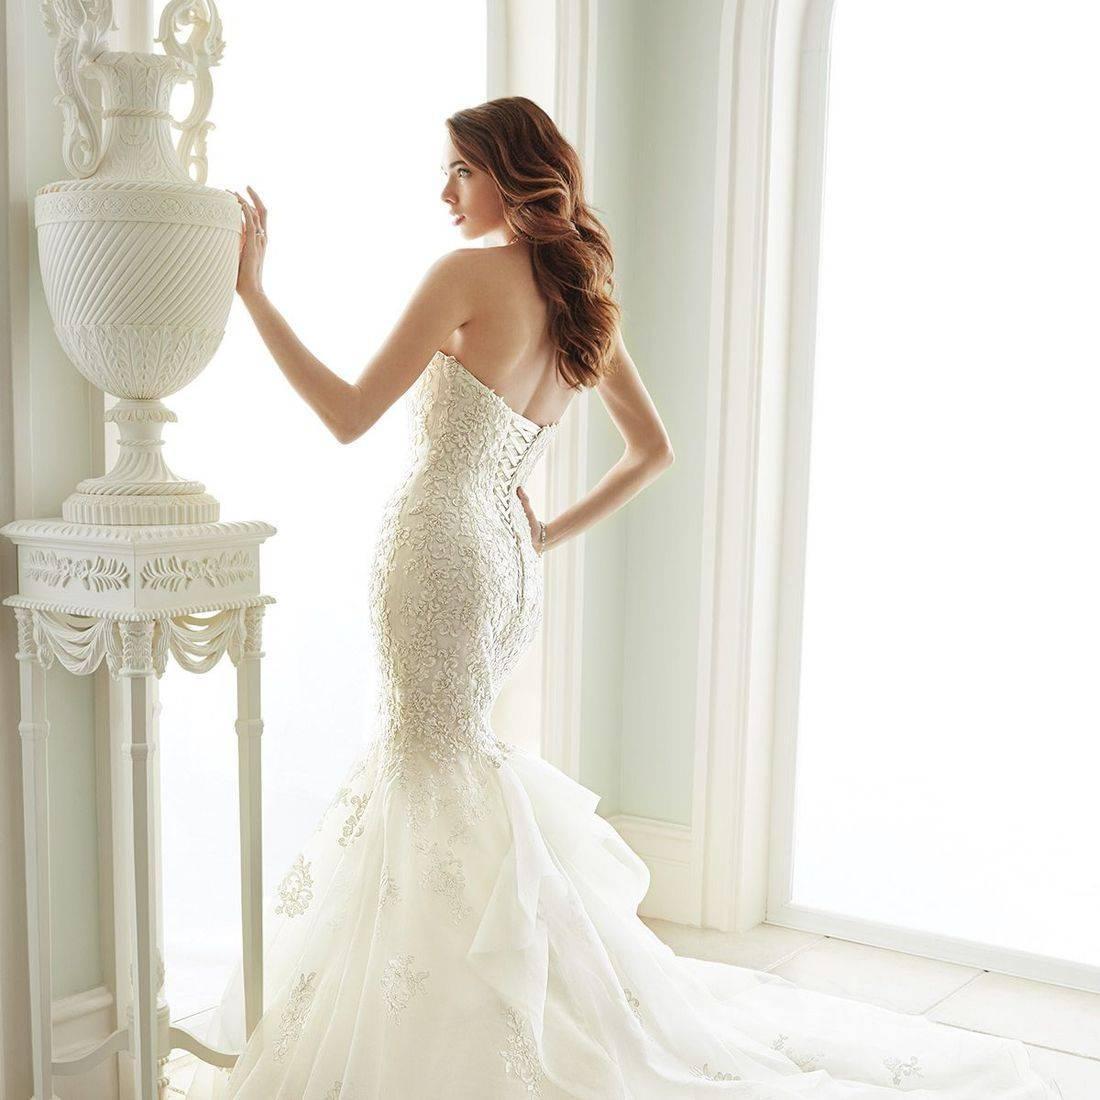 sophia tolli, sophia tolli wedding dress, organza wedding dress, fitted wedding dress, strapless wedding dress, elongated bodice wedding dress, sparkly wedding dress, ruffled wedding dress